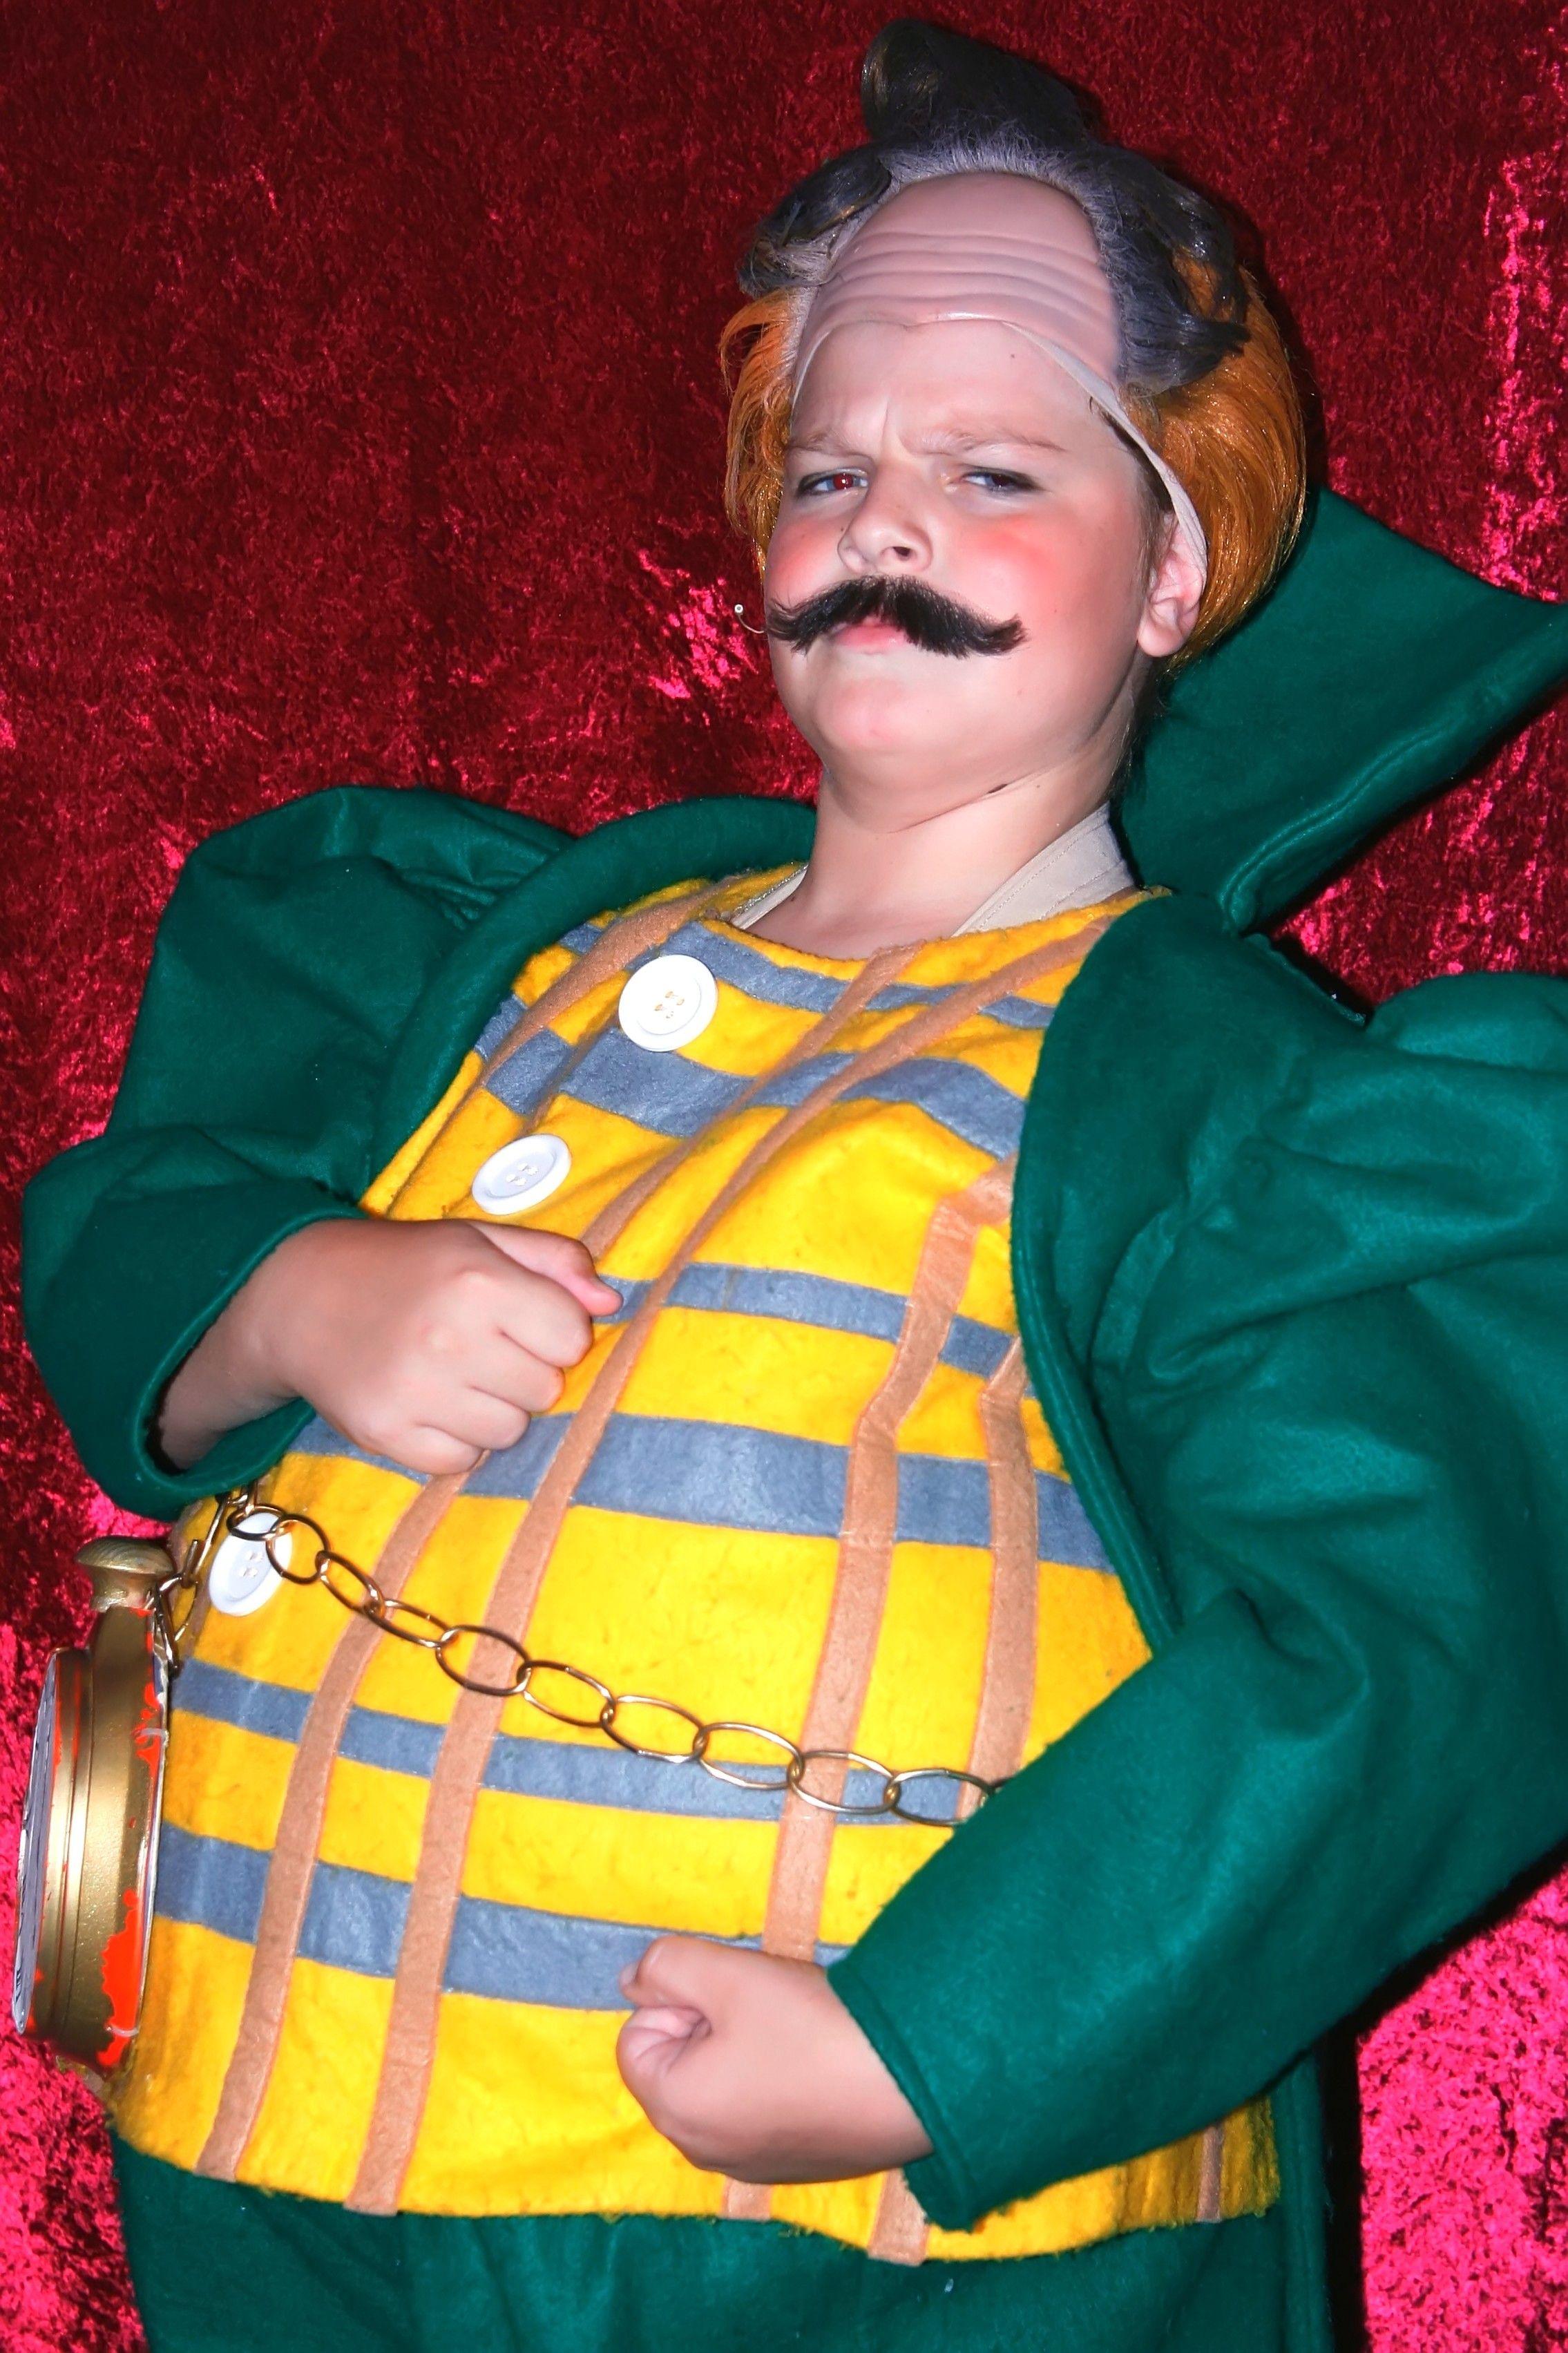 Wizard of Oz munchikin Costume Patterns | Wizard Of Oz Rentals ...